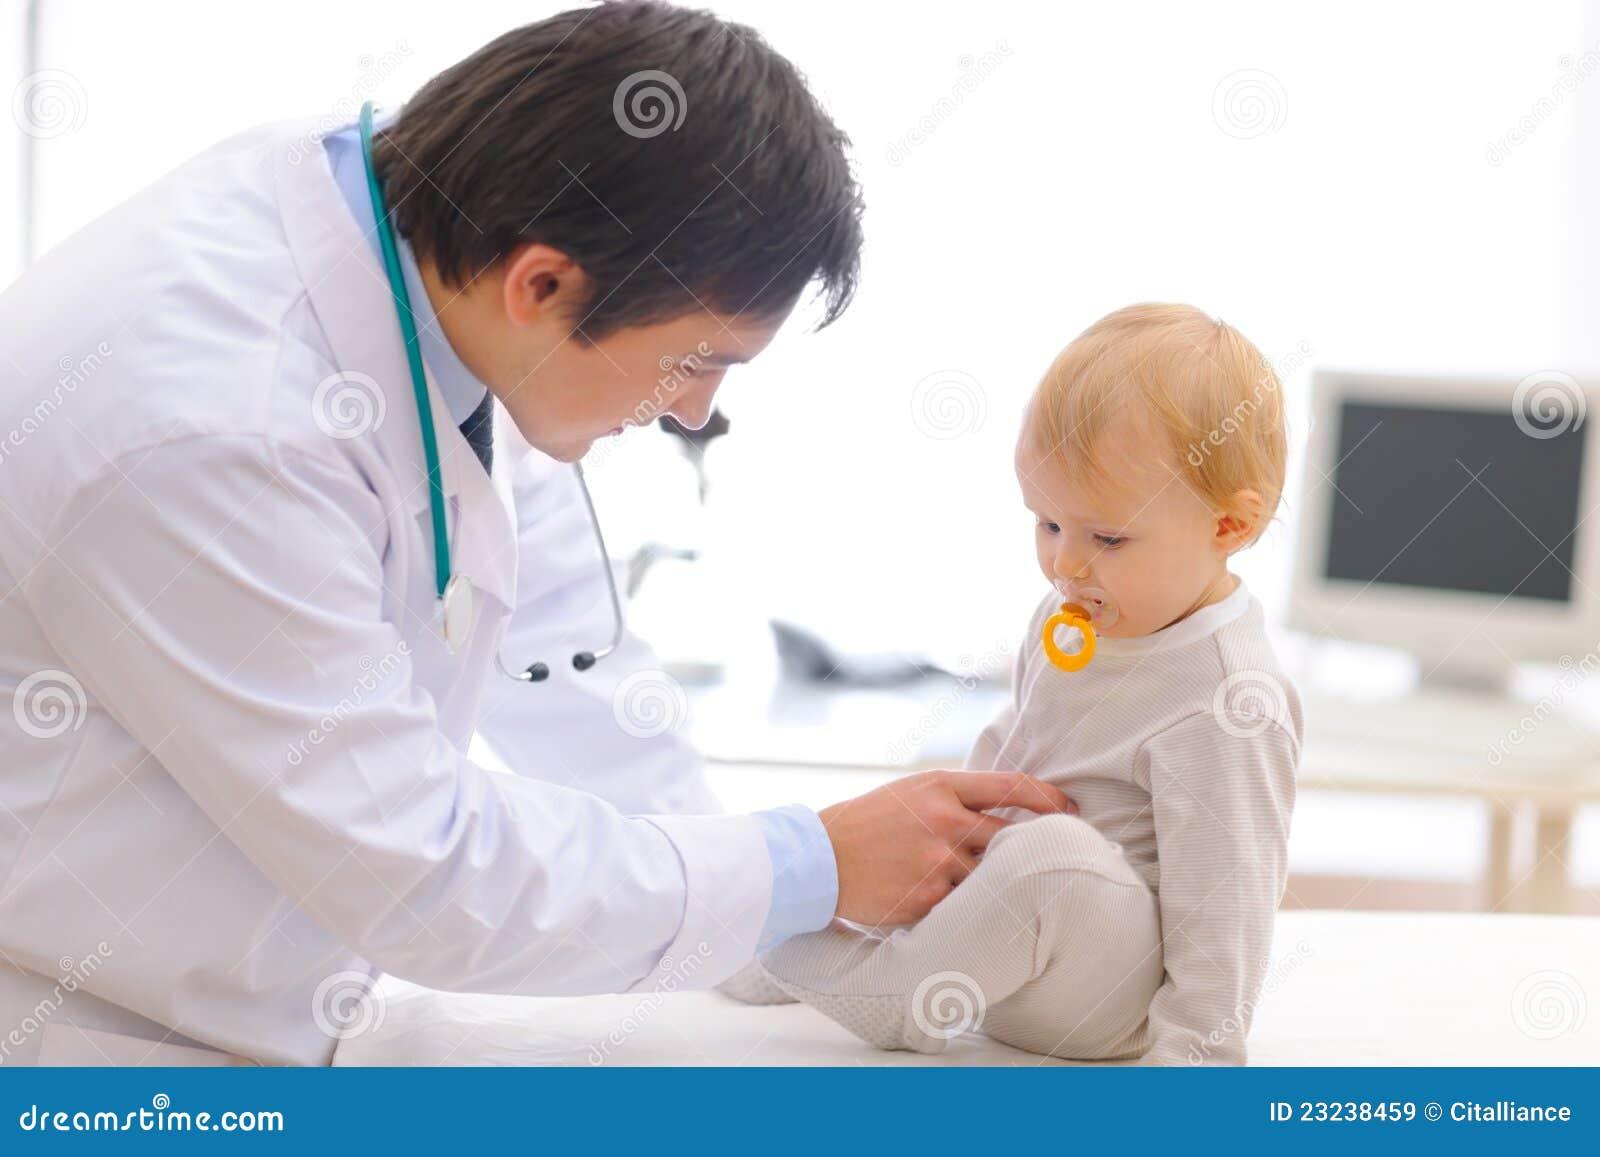 http://thumbs.dreamstime.com/z/pediatric-doctor-checking-baby-using-stethoscope-23238459.jpg Pediatric